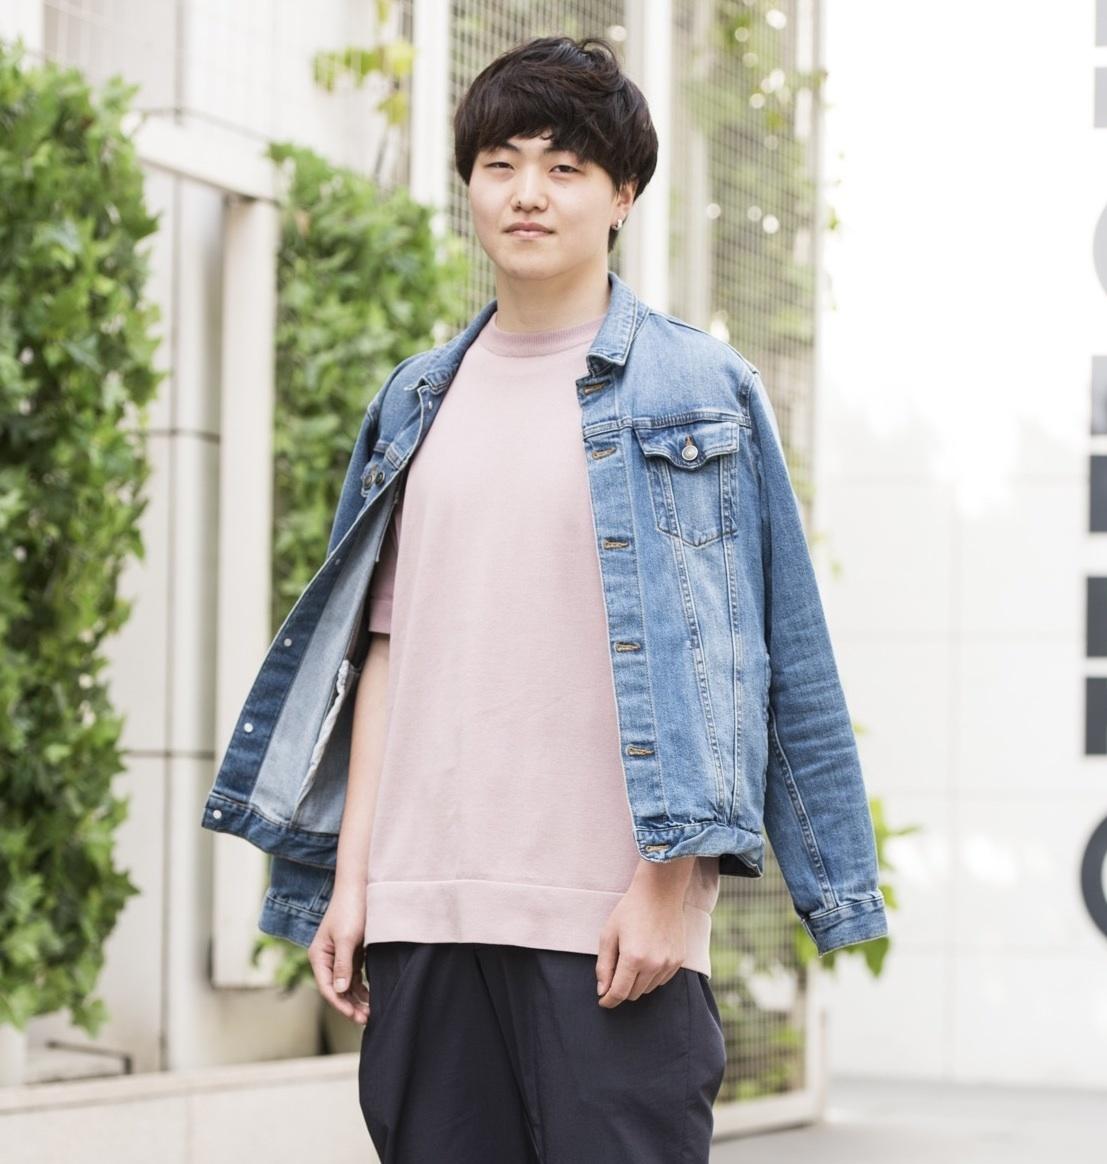 【SNAP JACK】密かなブーム「ピンク男子」をキャッチ! 今田健斗くん・神奈川大学